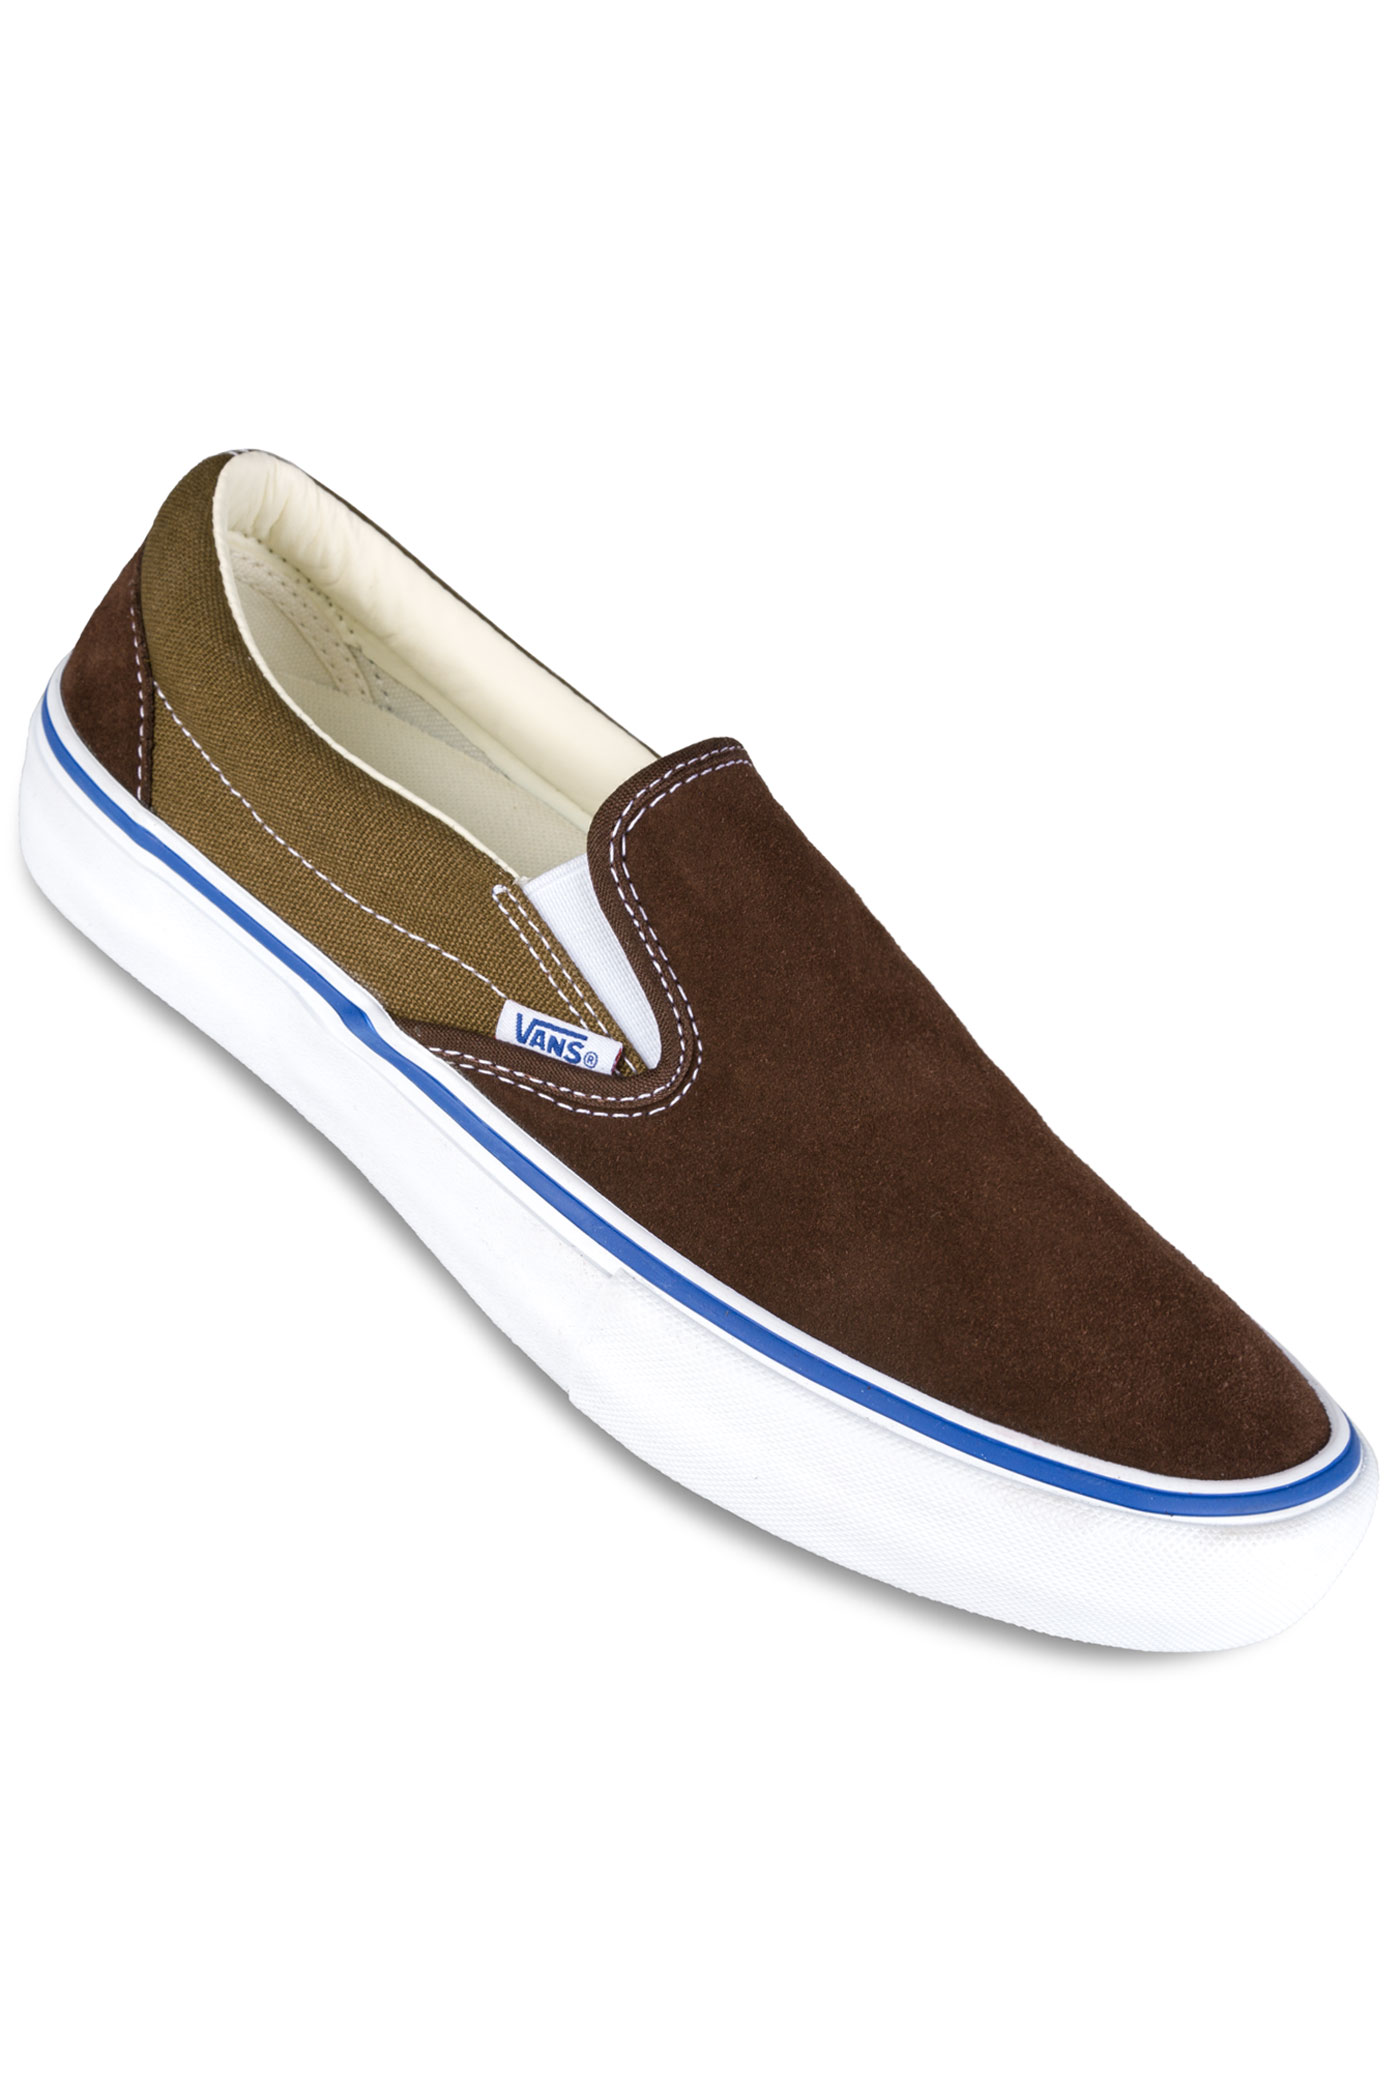 vans slip on pro chaussure coffee bean teak achetez sur skatedeluxe. Black Bedroom Furniture Sets. Home Design Ideas